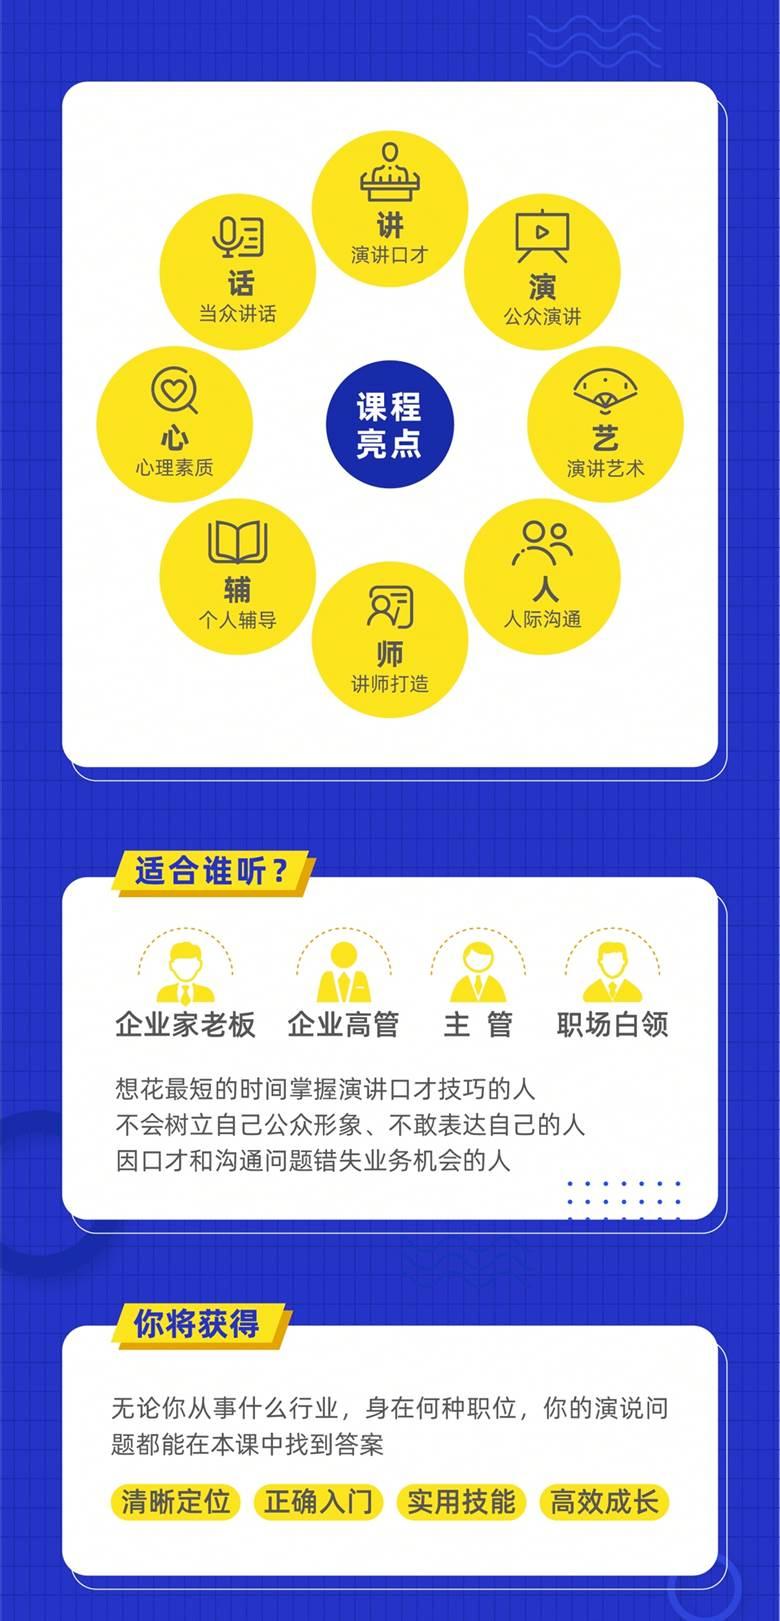 http://www.huodongxing.com/file/20160330/2512280531473/743966239121395.jpg